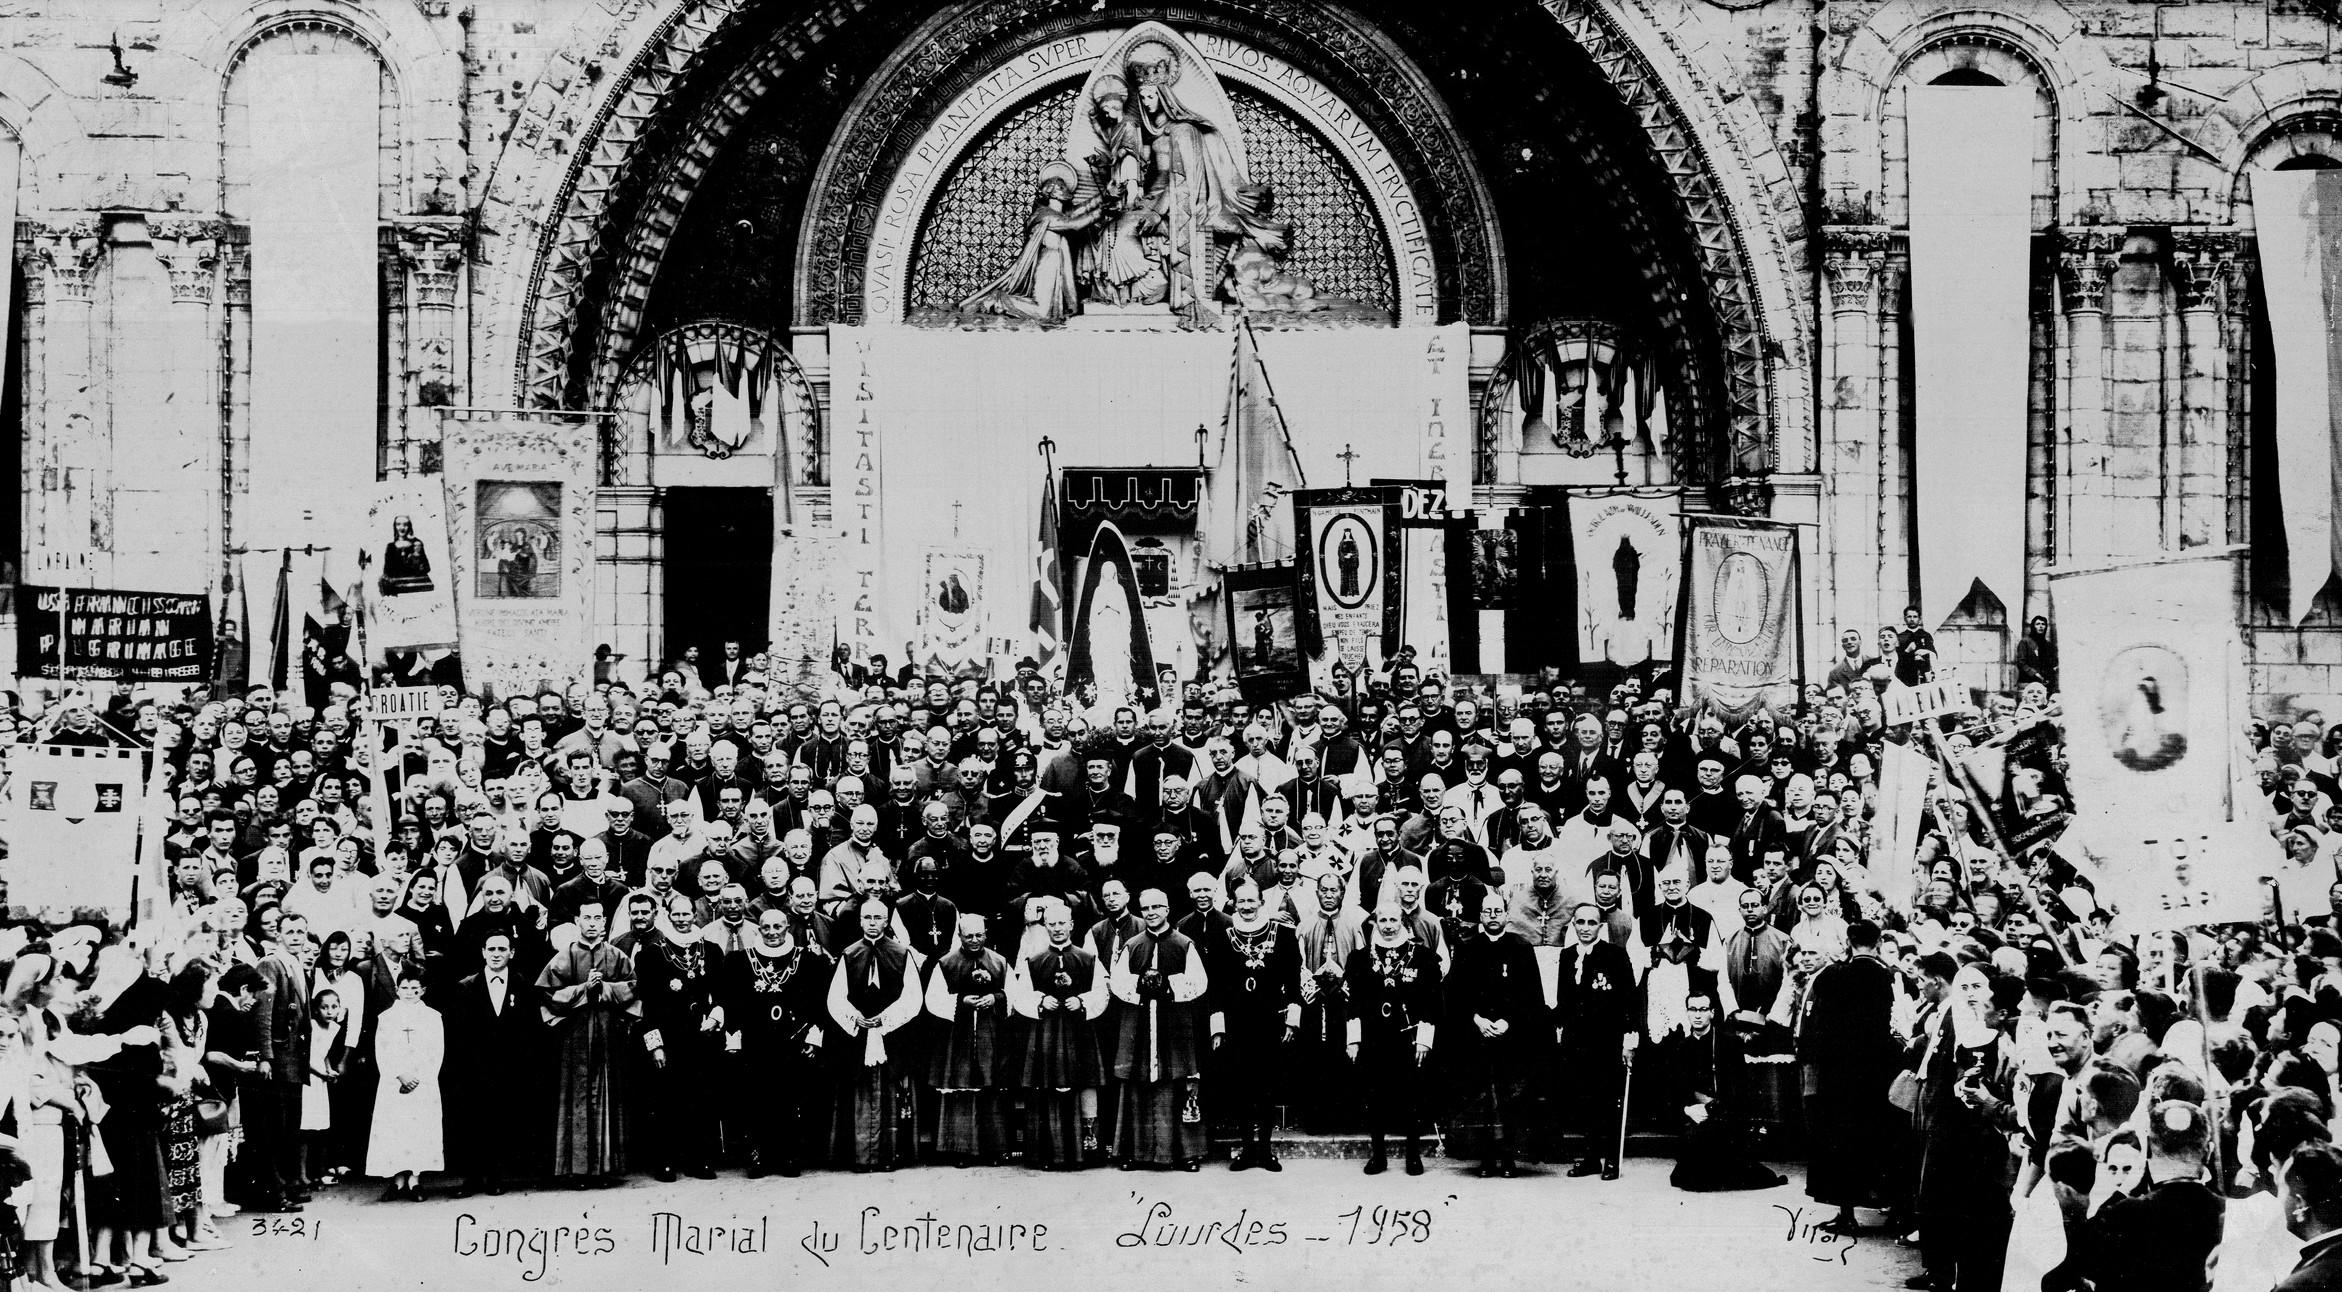 Congres Marial Lourdes 1958